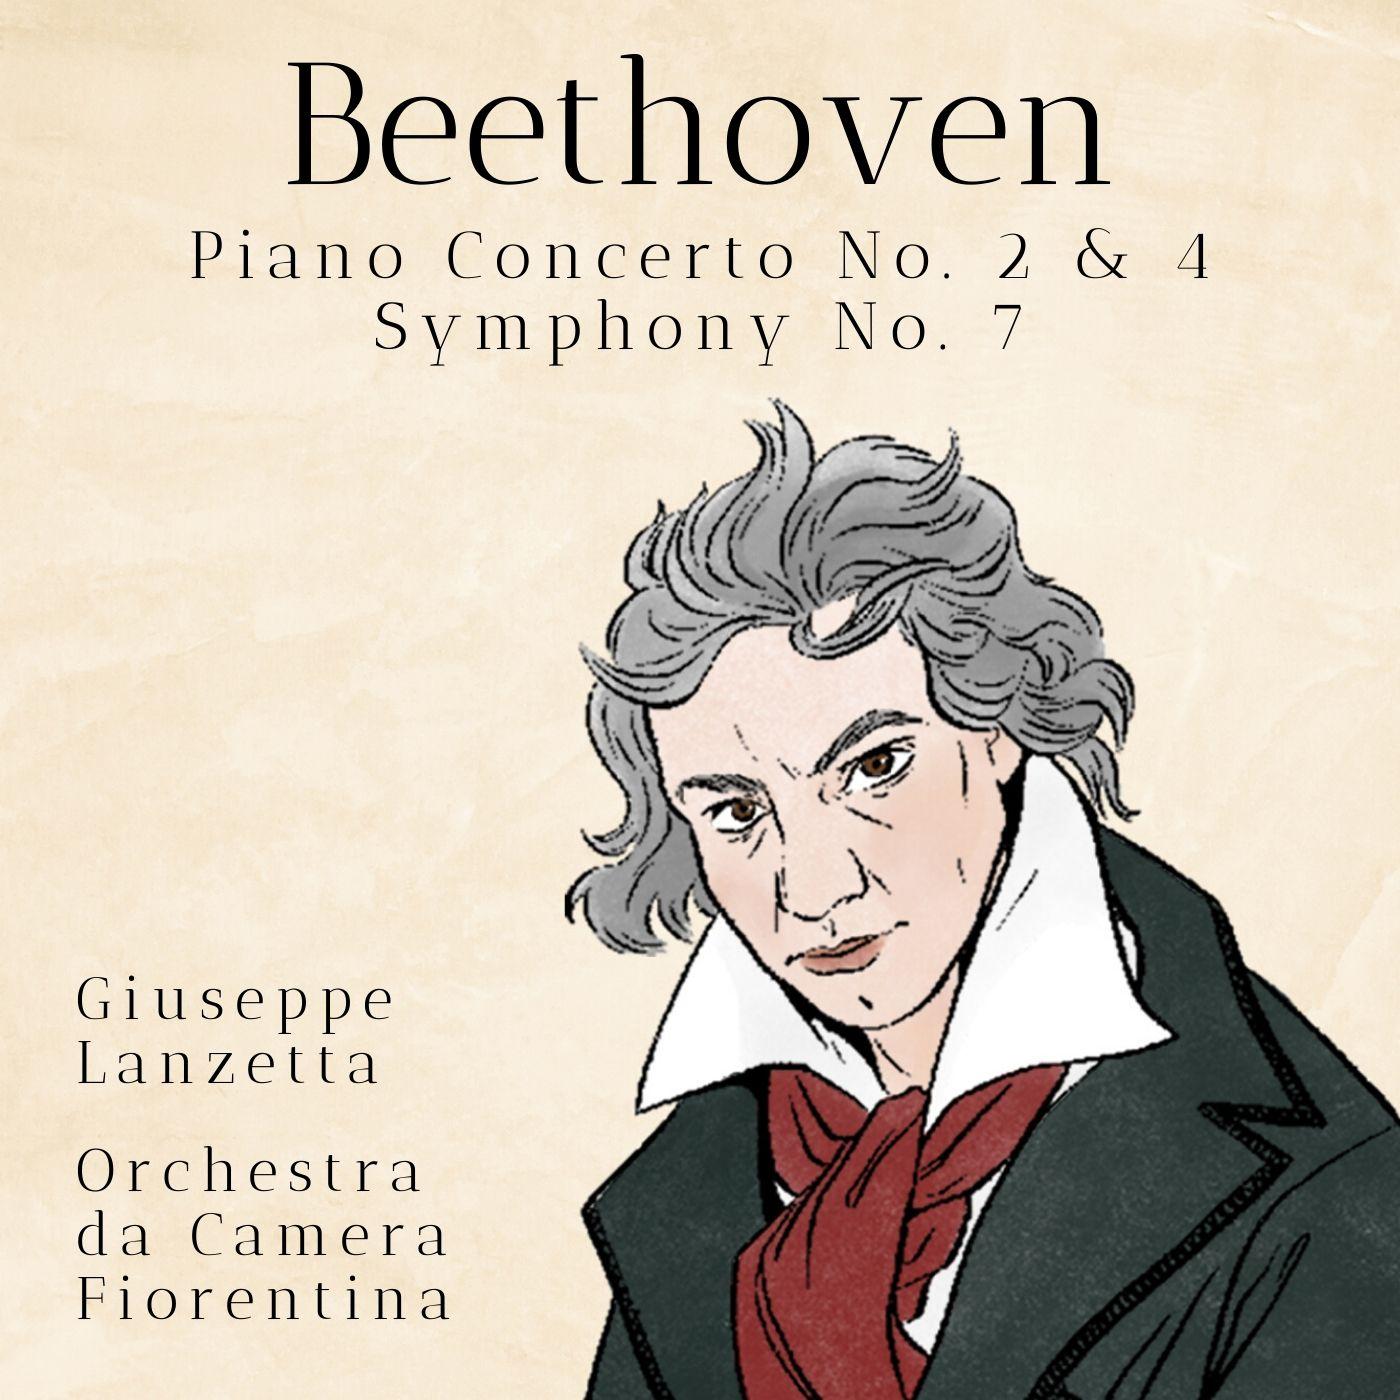 Beethoven: Piano Concerto No. 2 & 4, Symphony No. 7